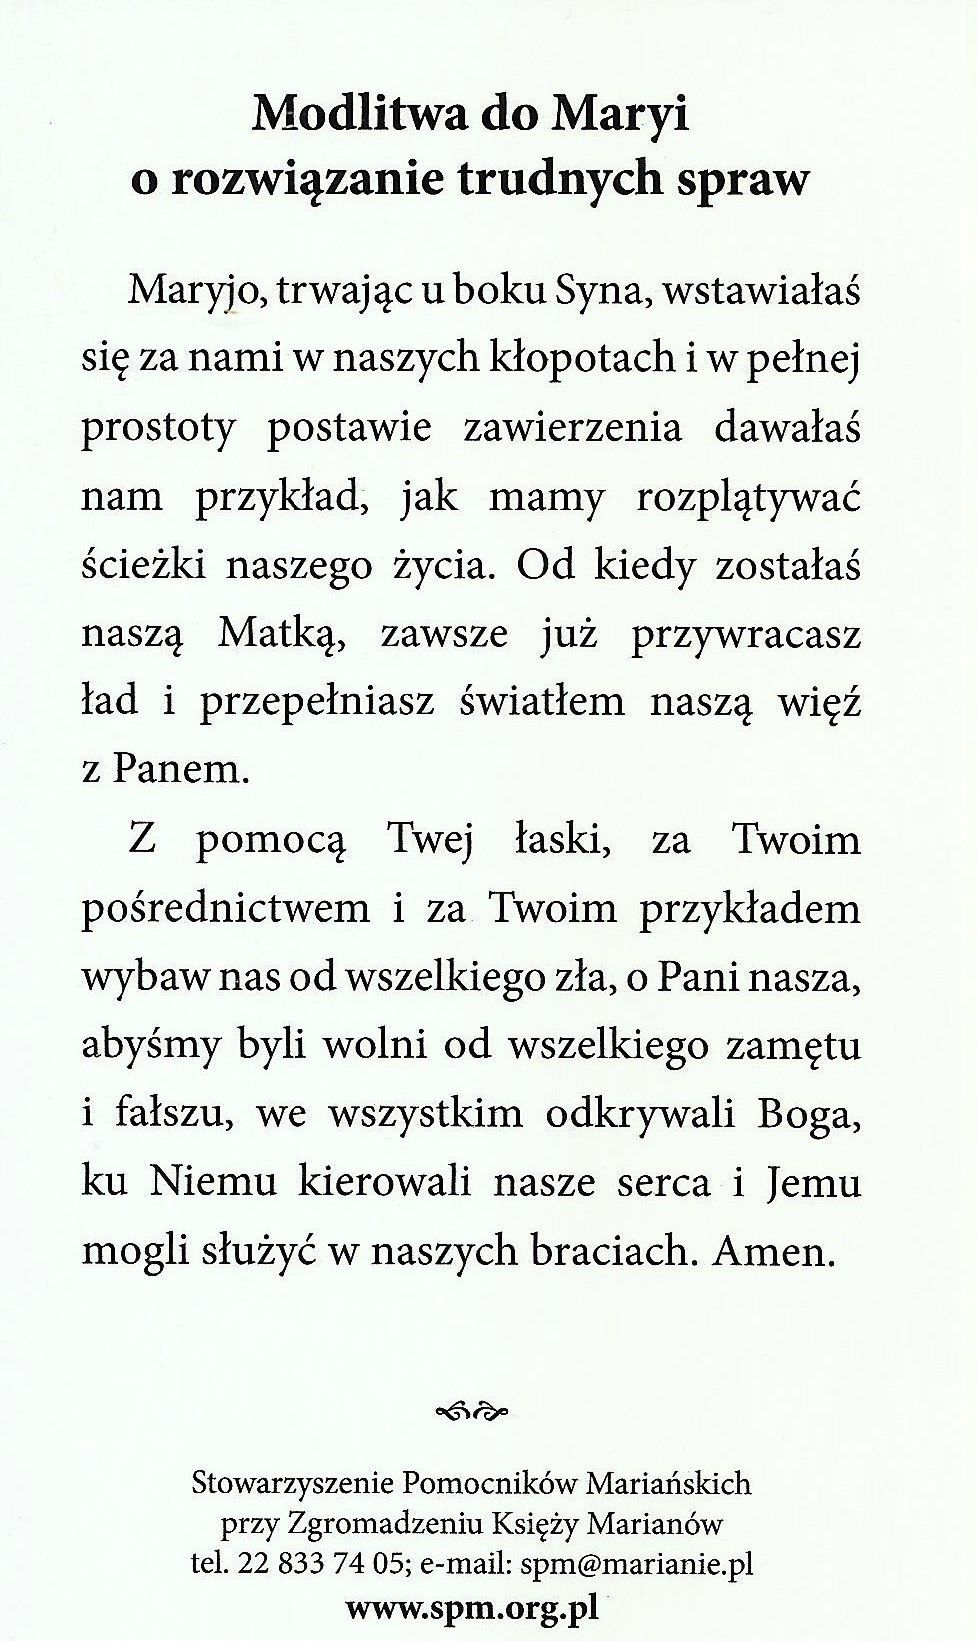 4. Modlitwa